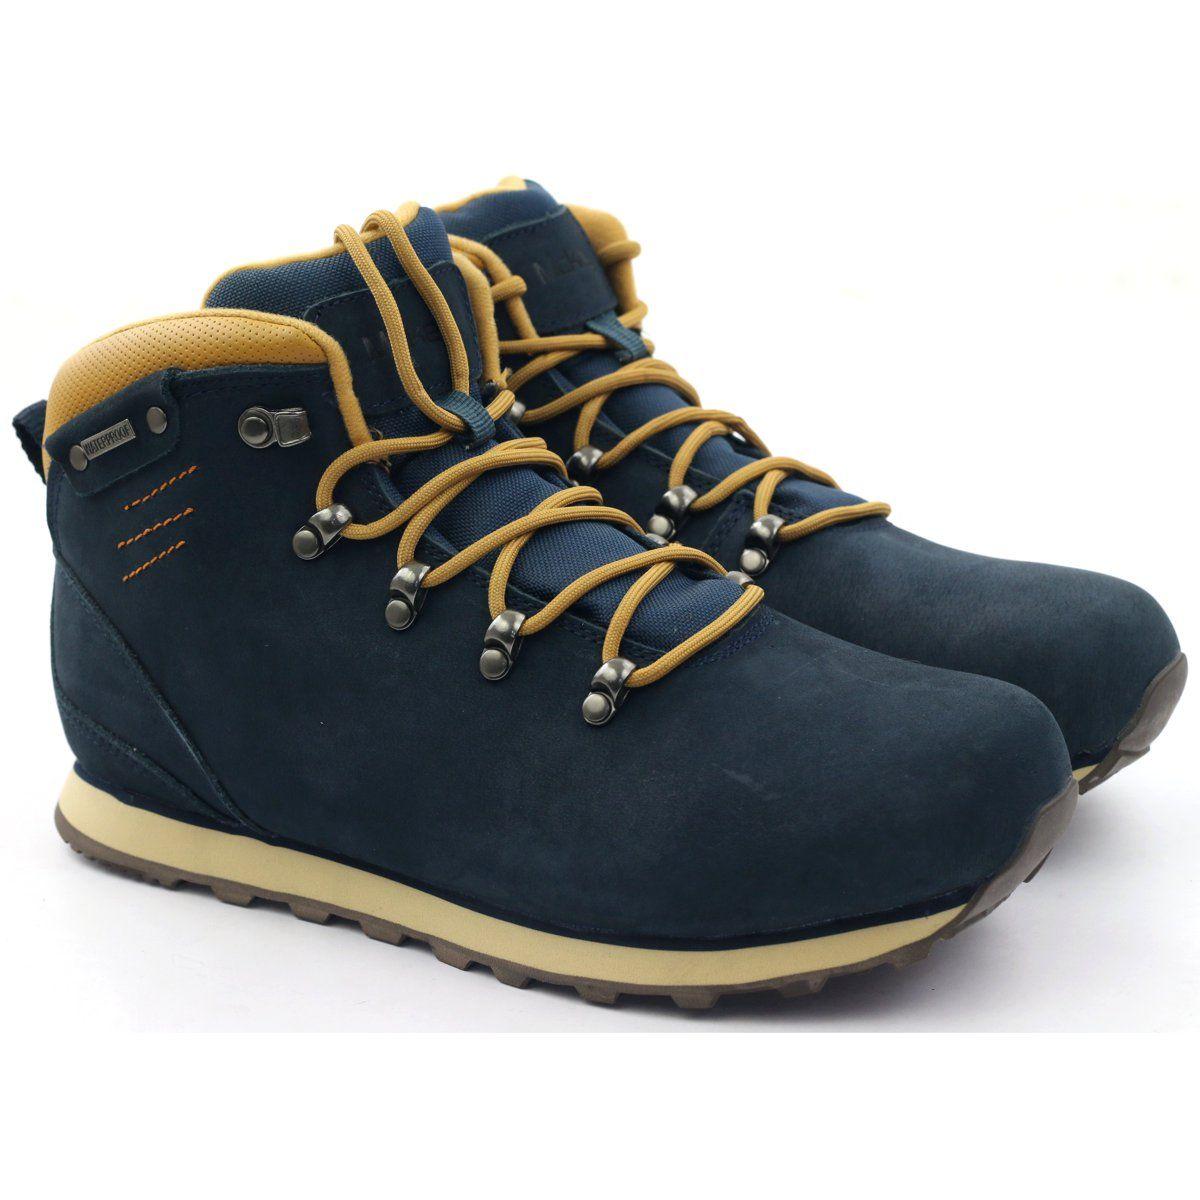 Mckey Trekkingowe Sportowe Membrana 419 Zolte Granatowe Boots Light Boots Hiking Boots